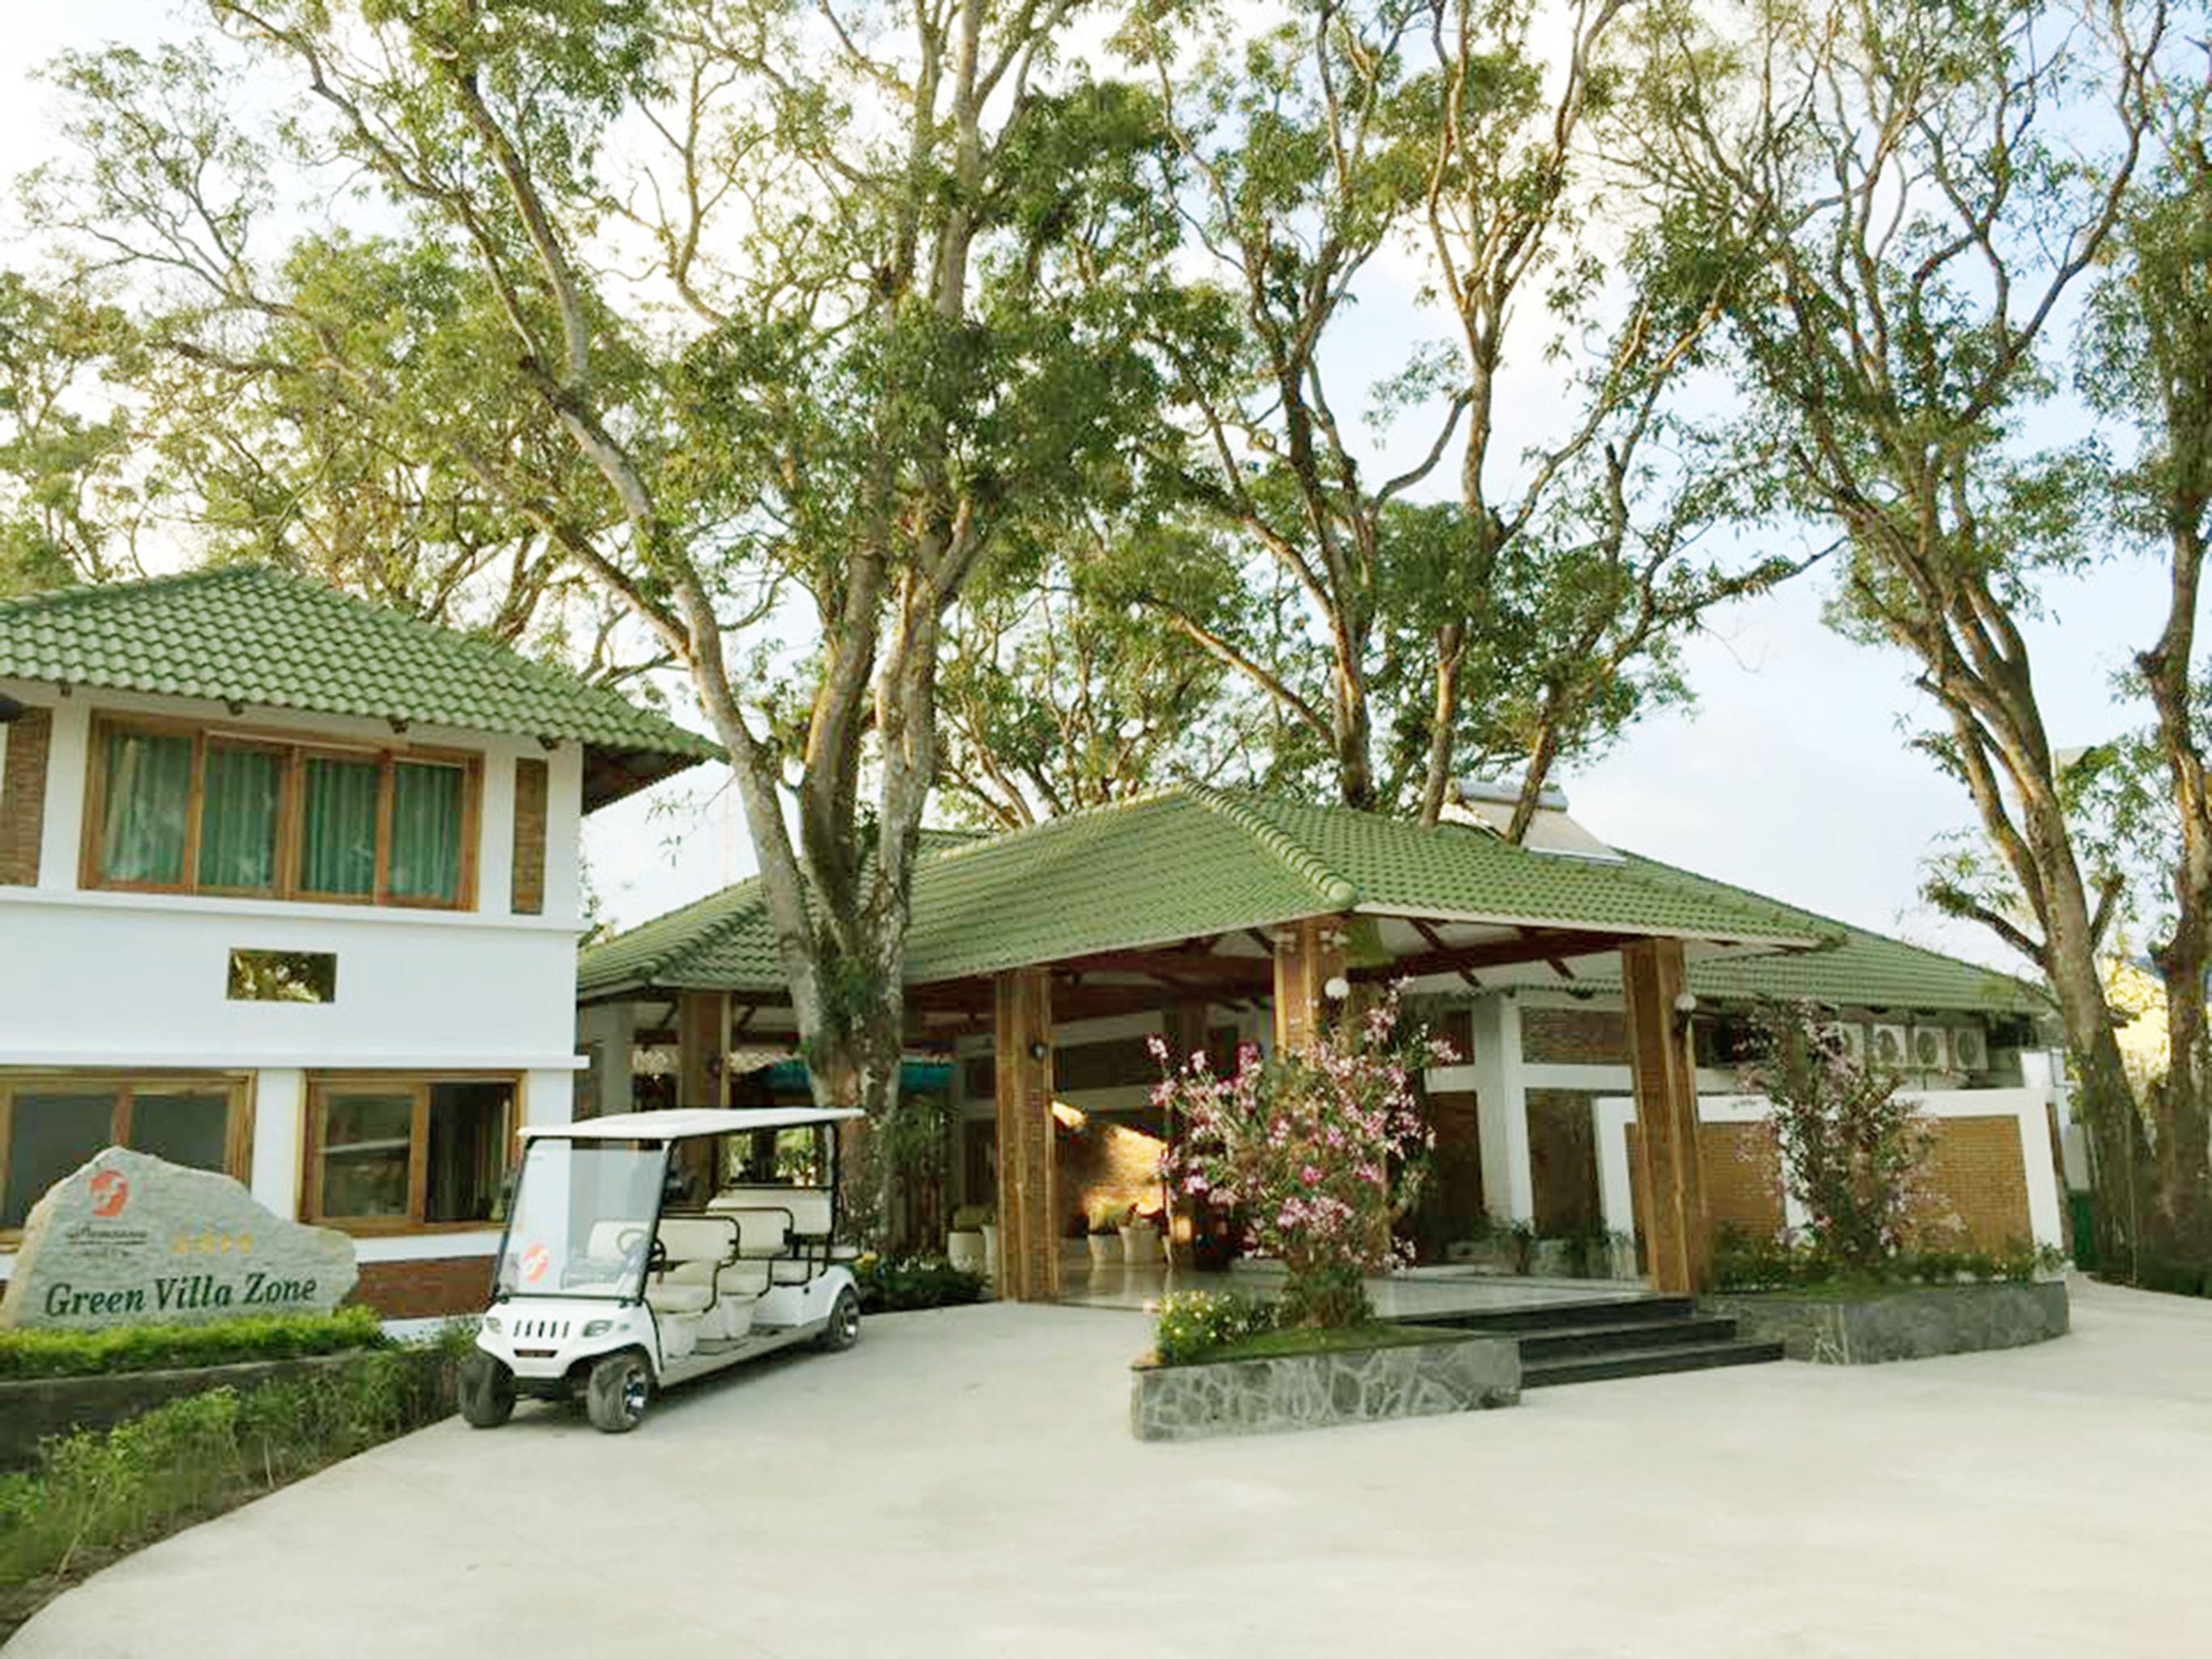 Famiana Resort & Spa - Beach Zone & Green Villa Zone